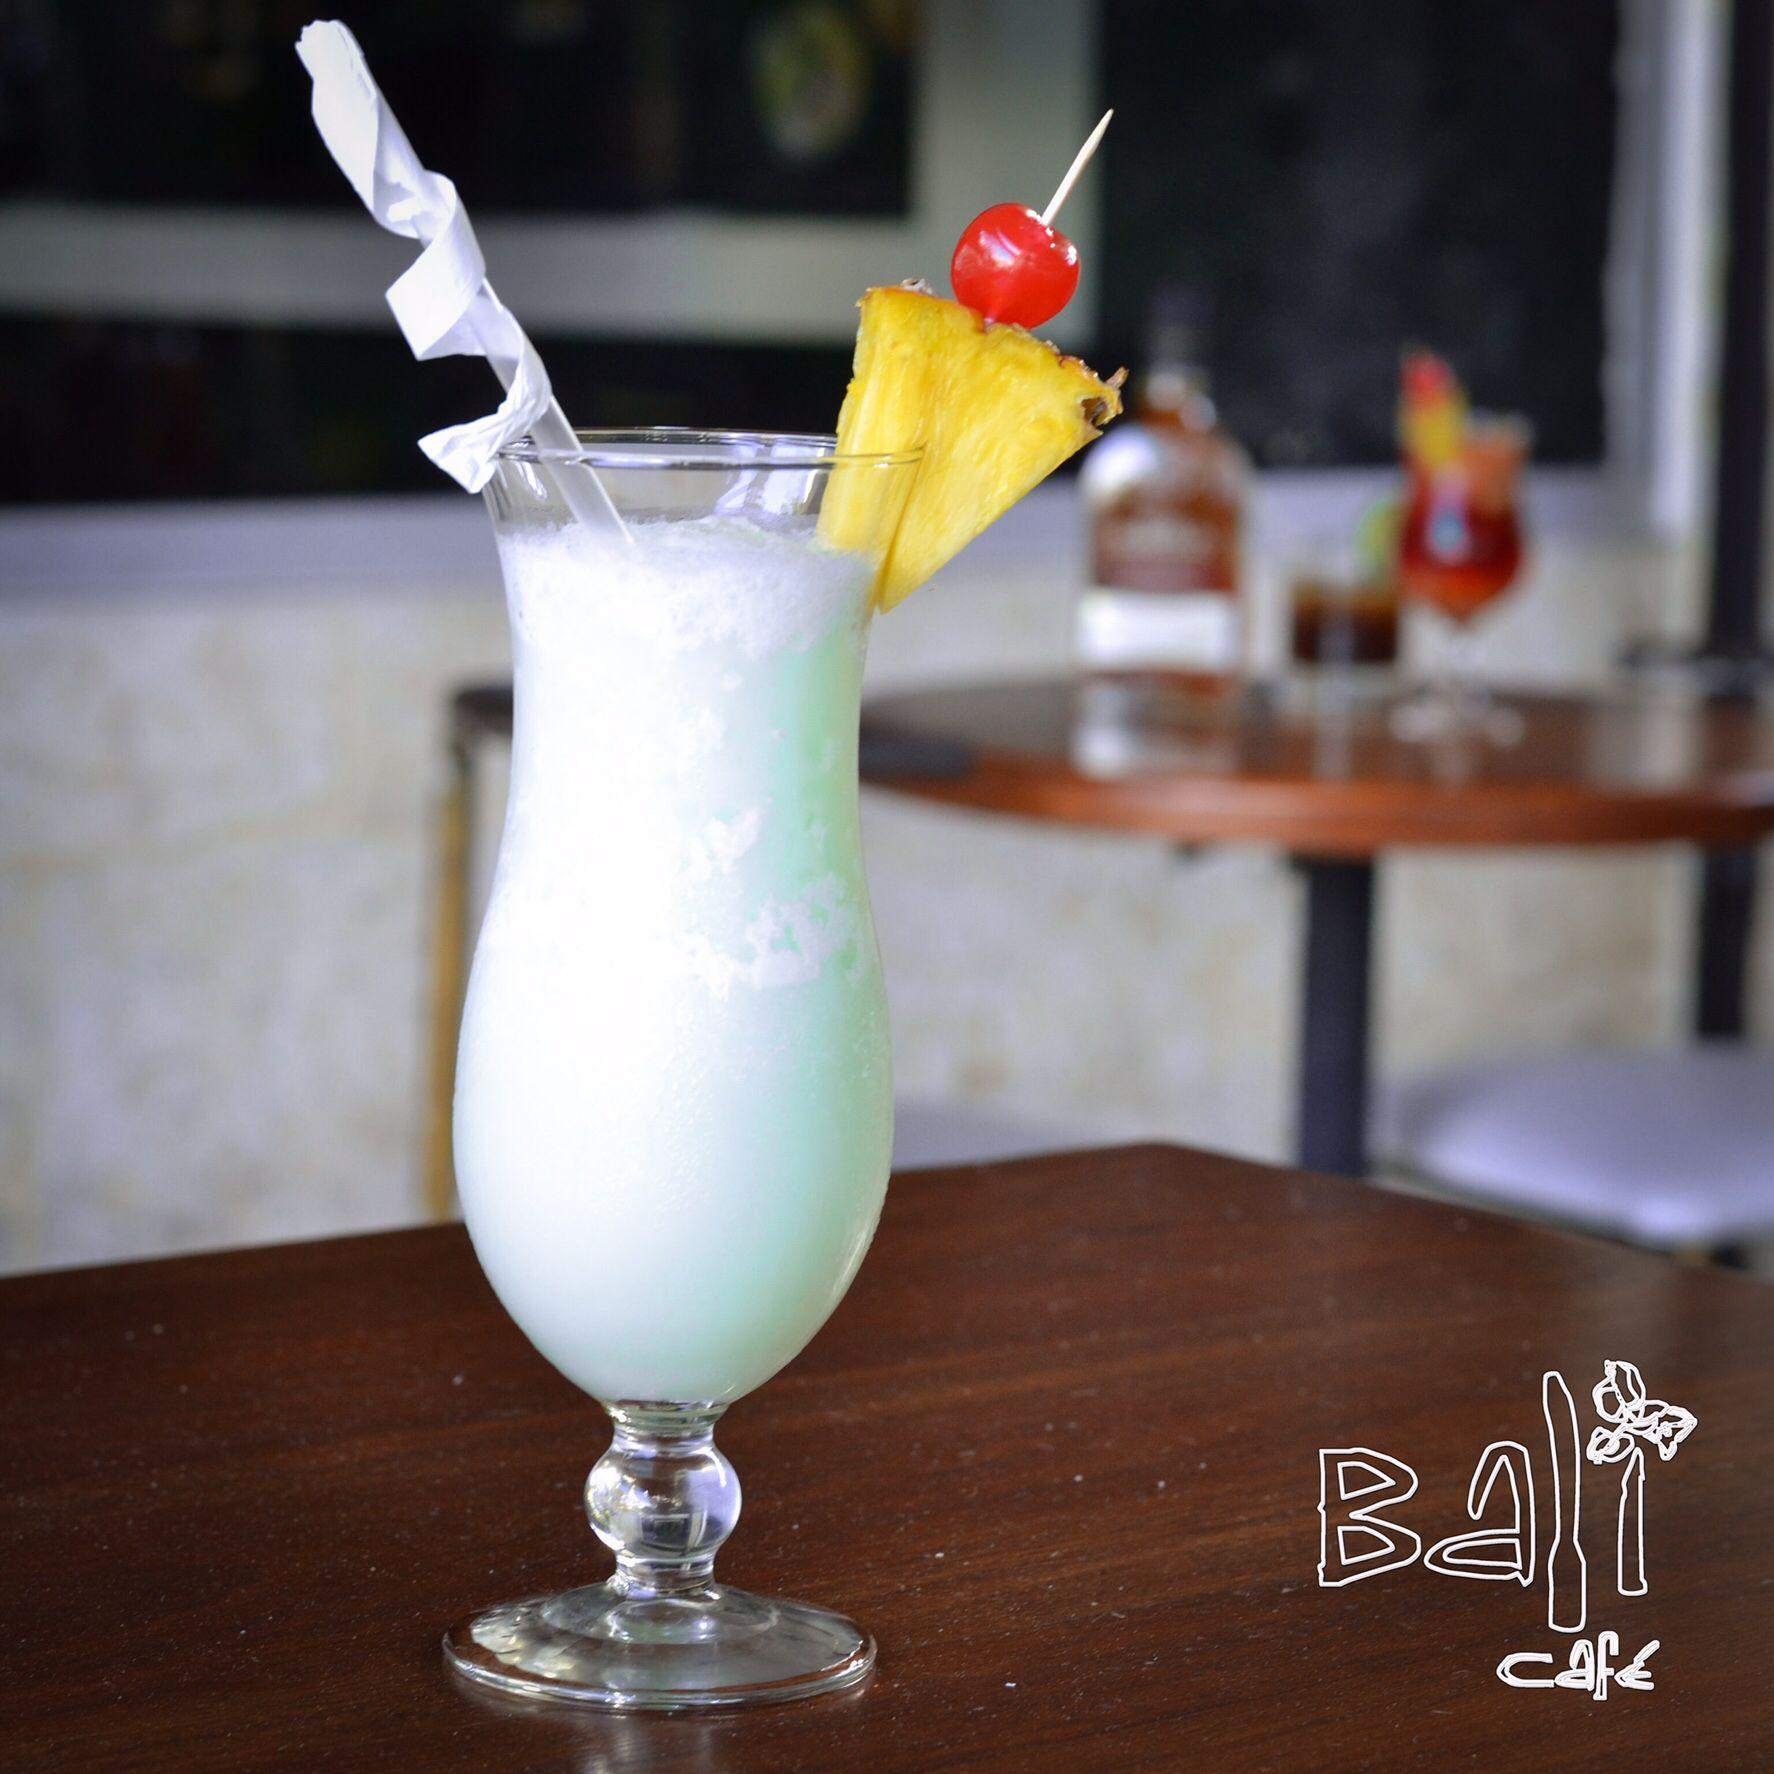 Roar reccomend Sperm cocktail drinks for ladies